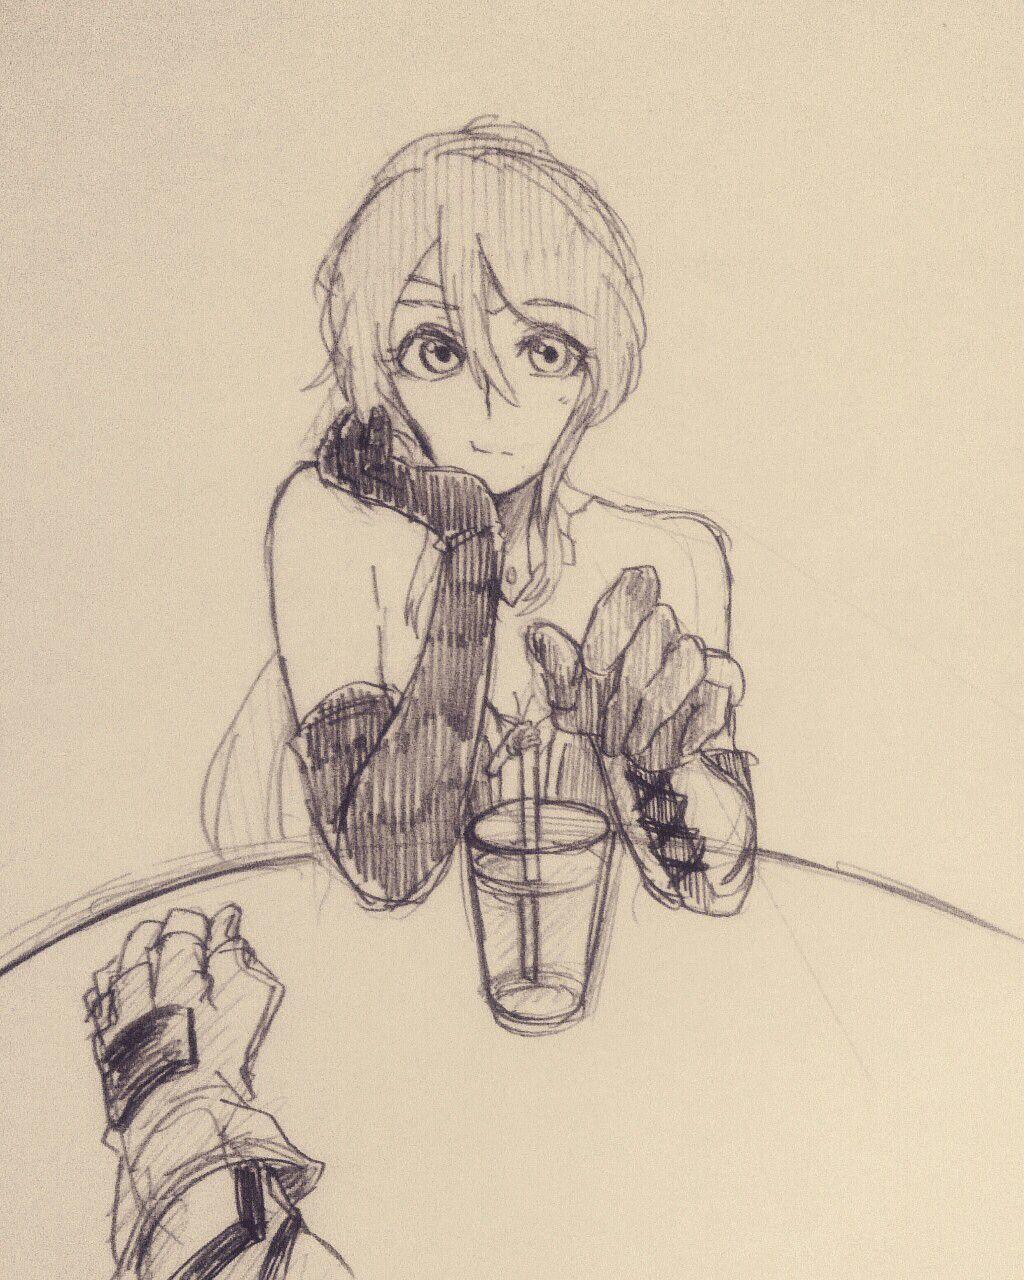 Arkos date sketch